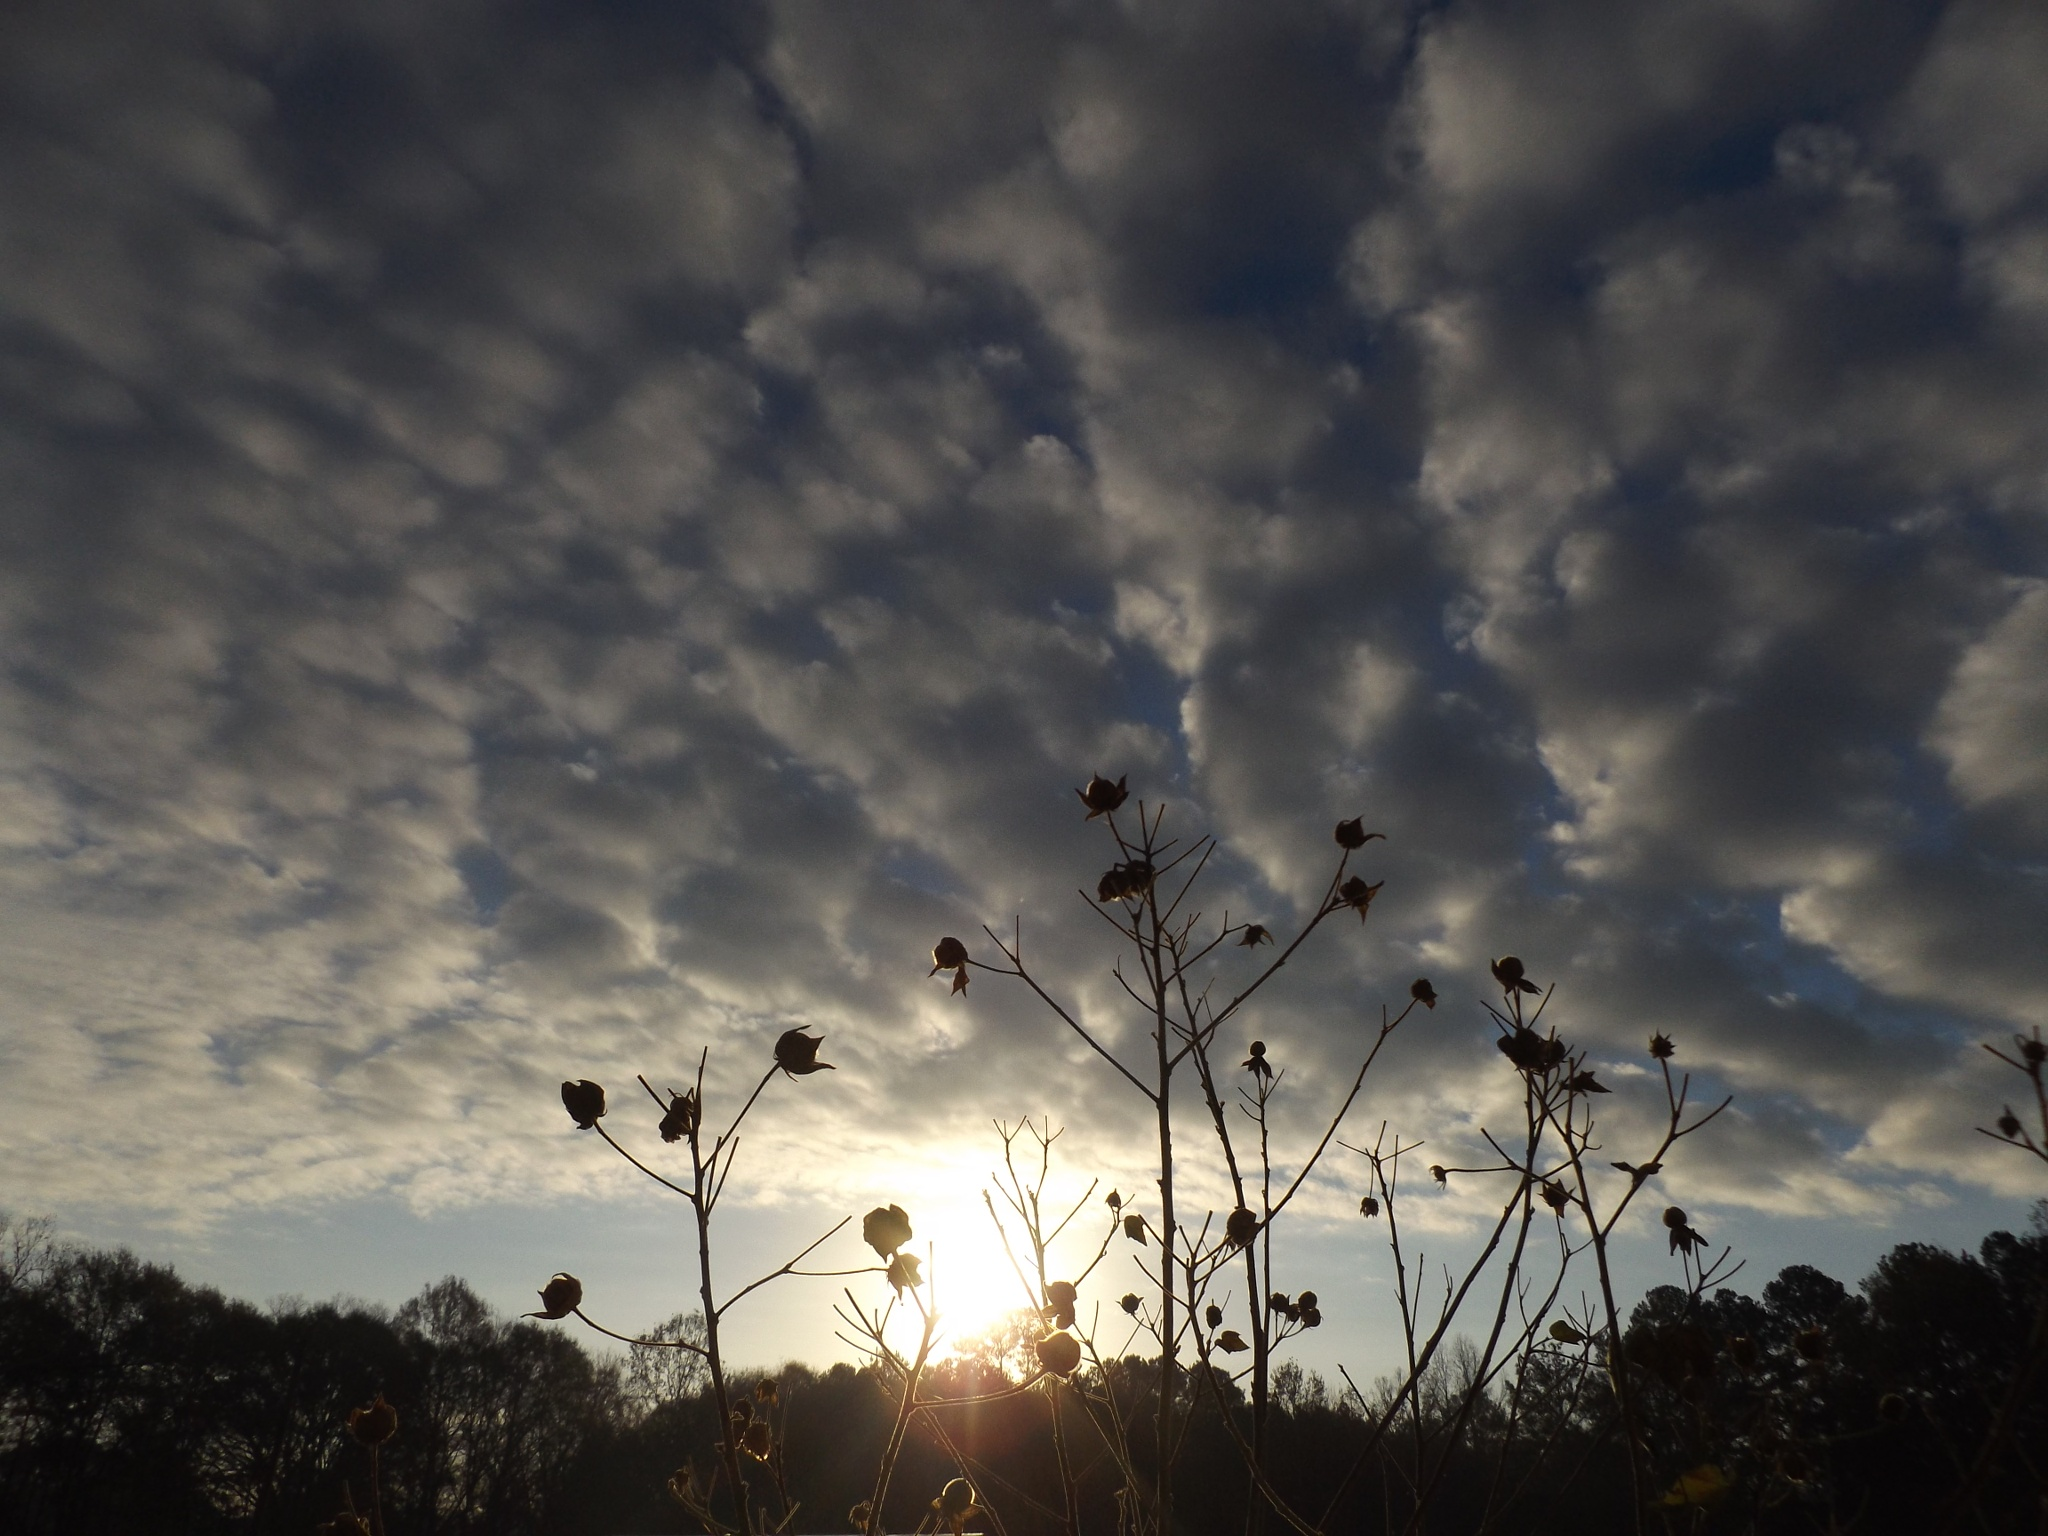 SUN & CLOUDS by ritamcbai66